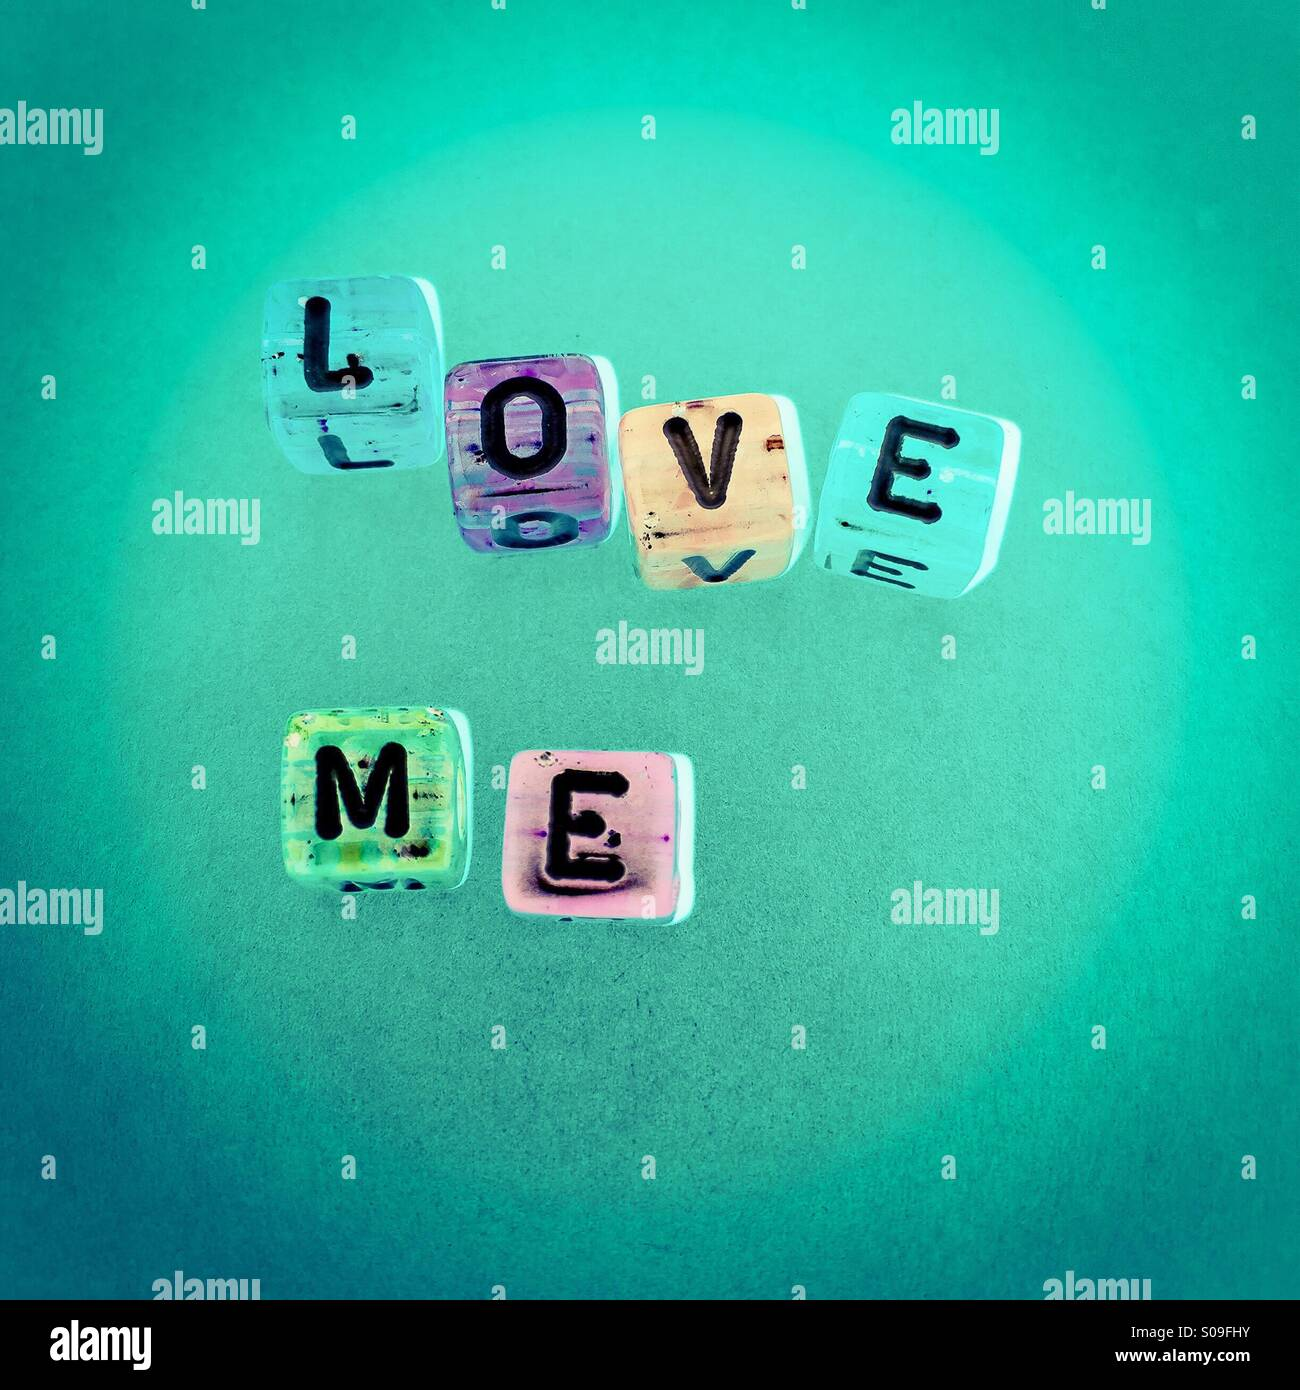 Love me - Stock Image